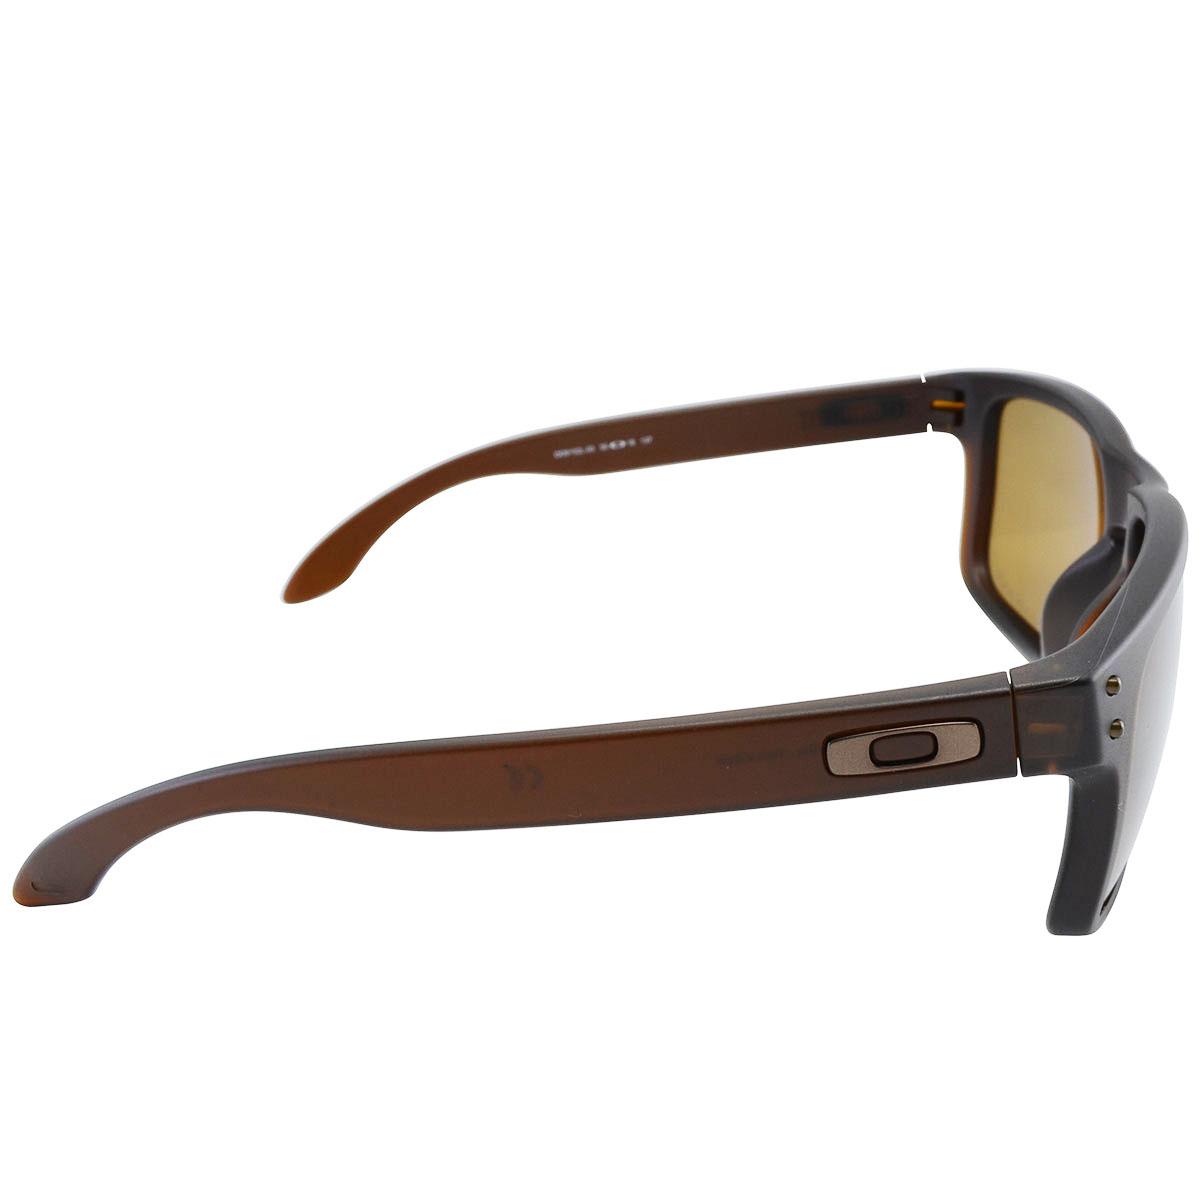 be57abaf5717c Óculos Oakley Holbrook Matte Rootbeer Lente Bronze Polarizado ref ...